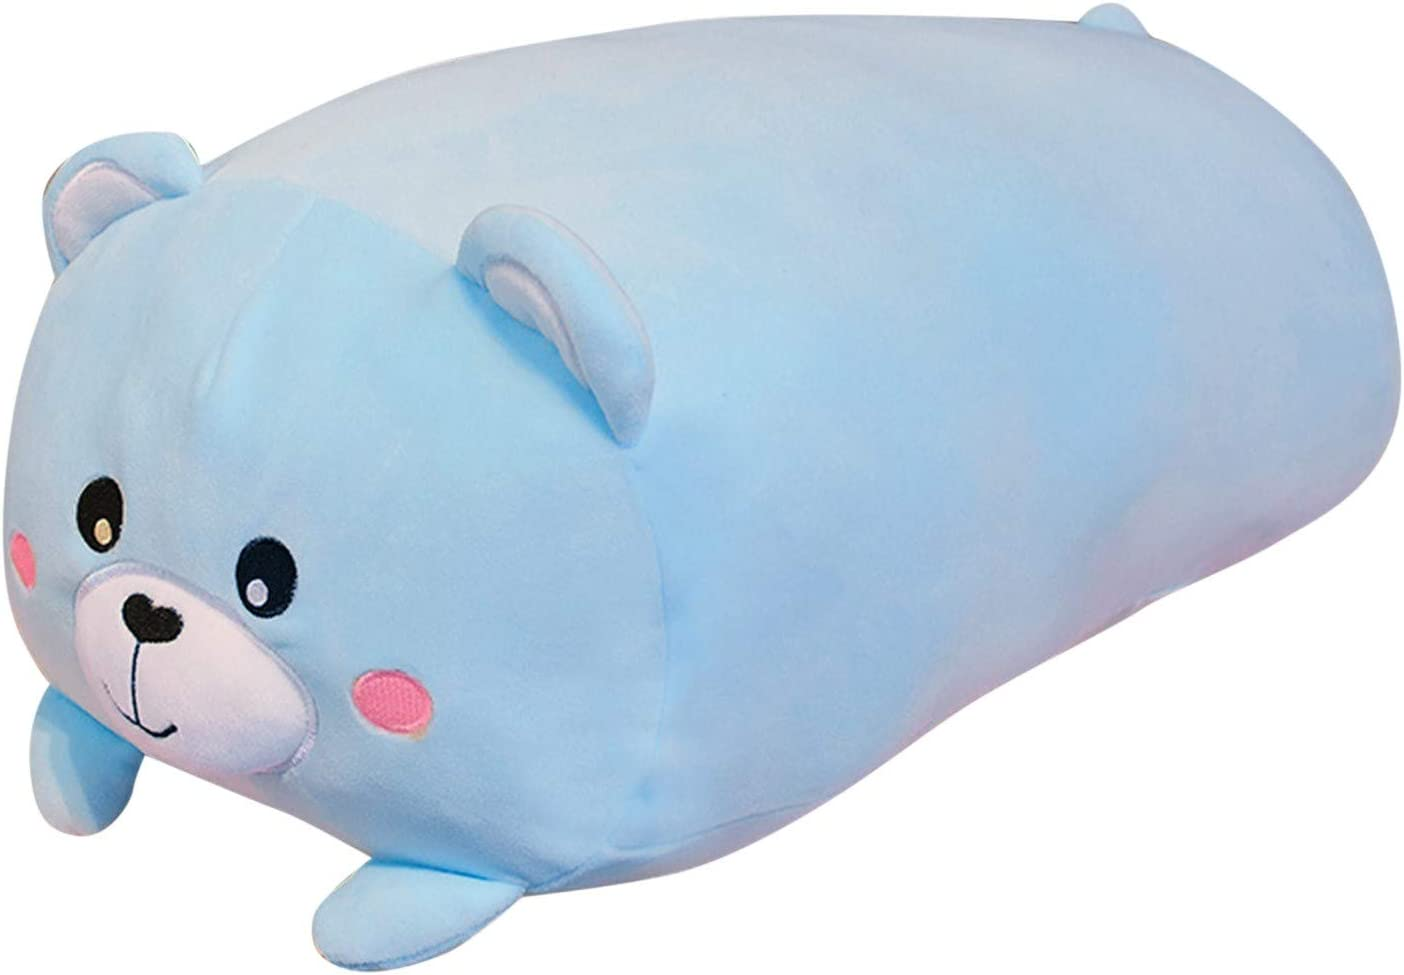 OMGYST Stuffed Animal Bread Plush Toast Food Plush Pillow Toy Anime Kawaii Soft Throw Pillow Doll, Cute Buddy Gifts for Boys Girls